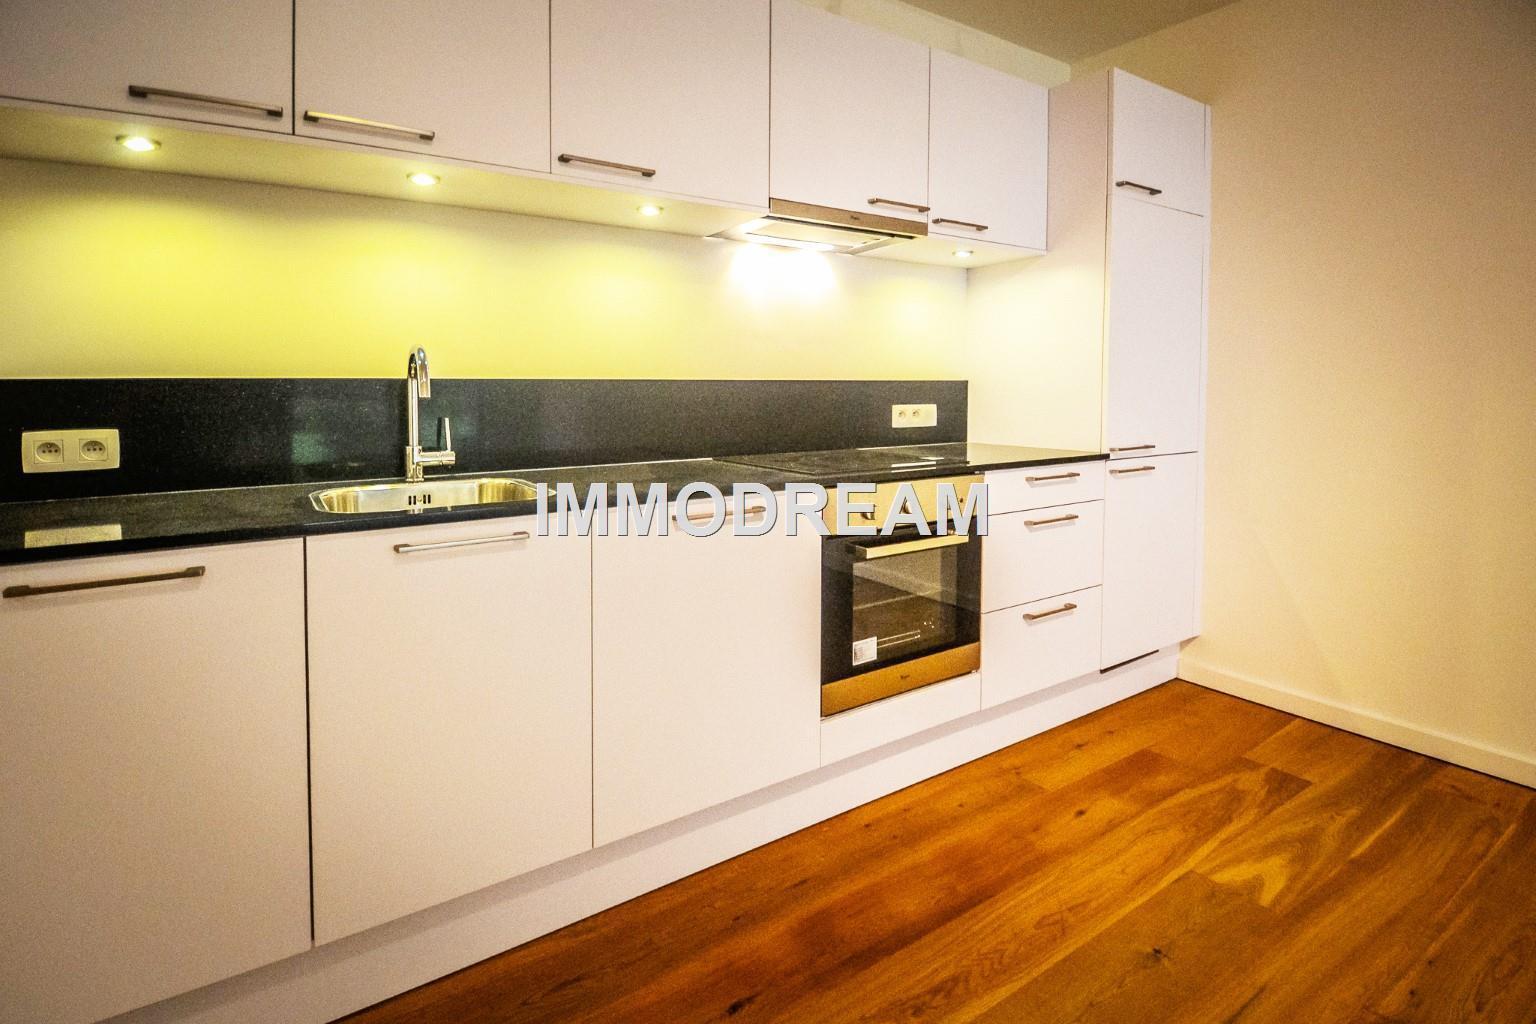 Residences-services - Wezembeek-Oppem - #3909185-6